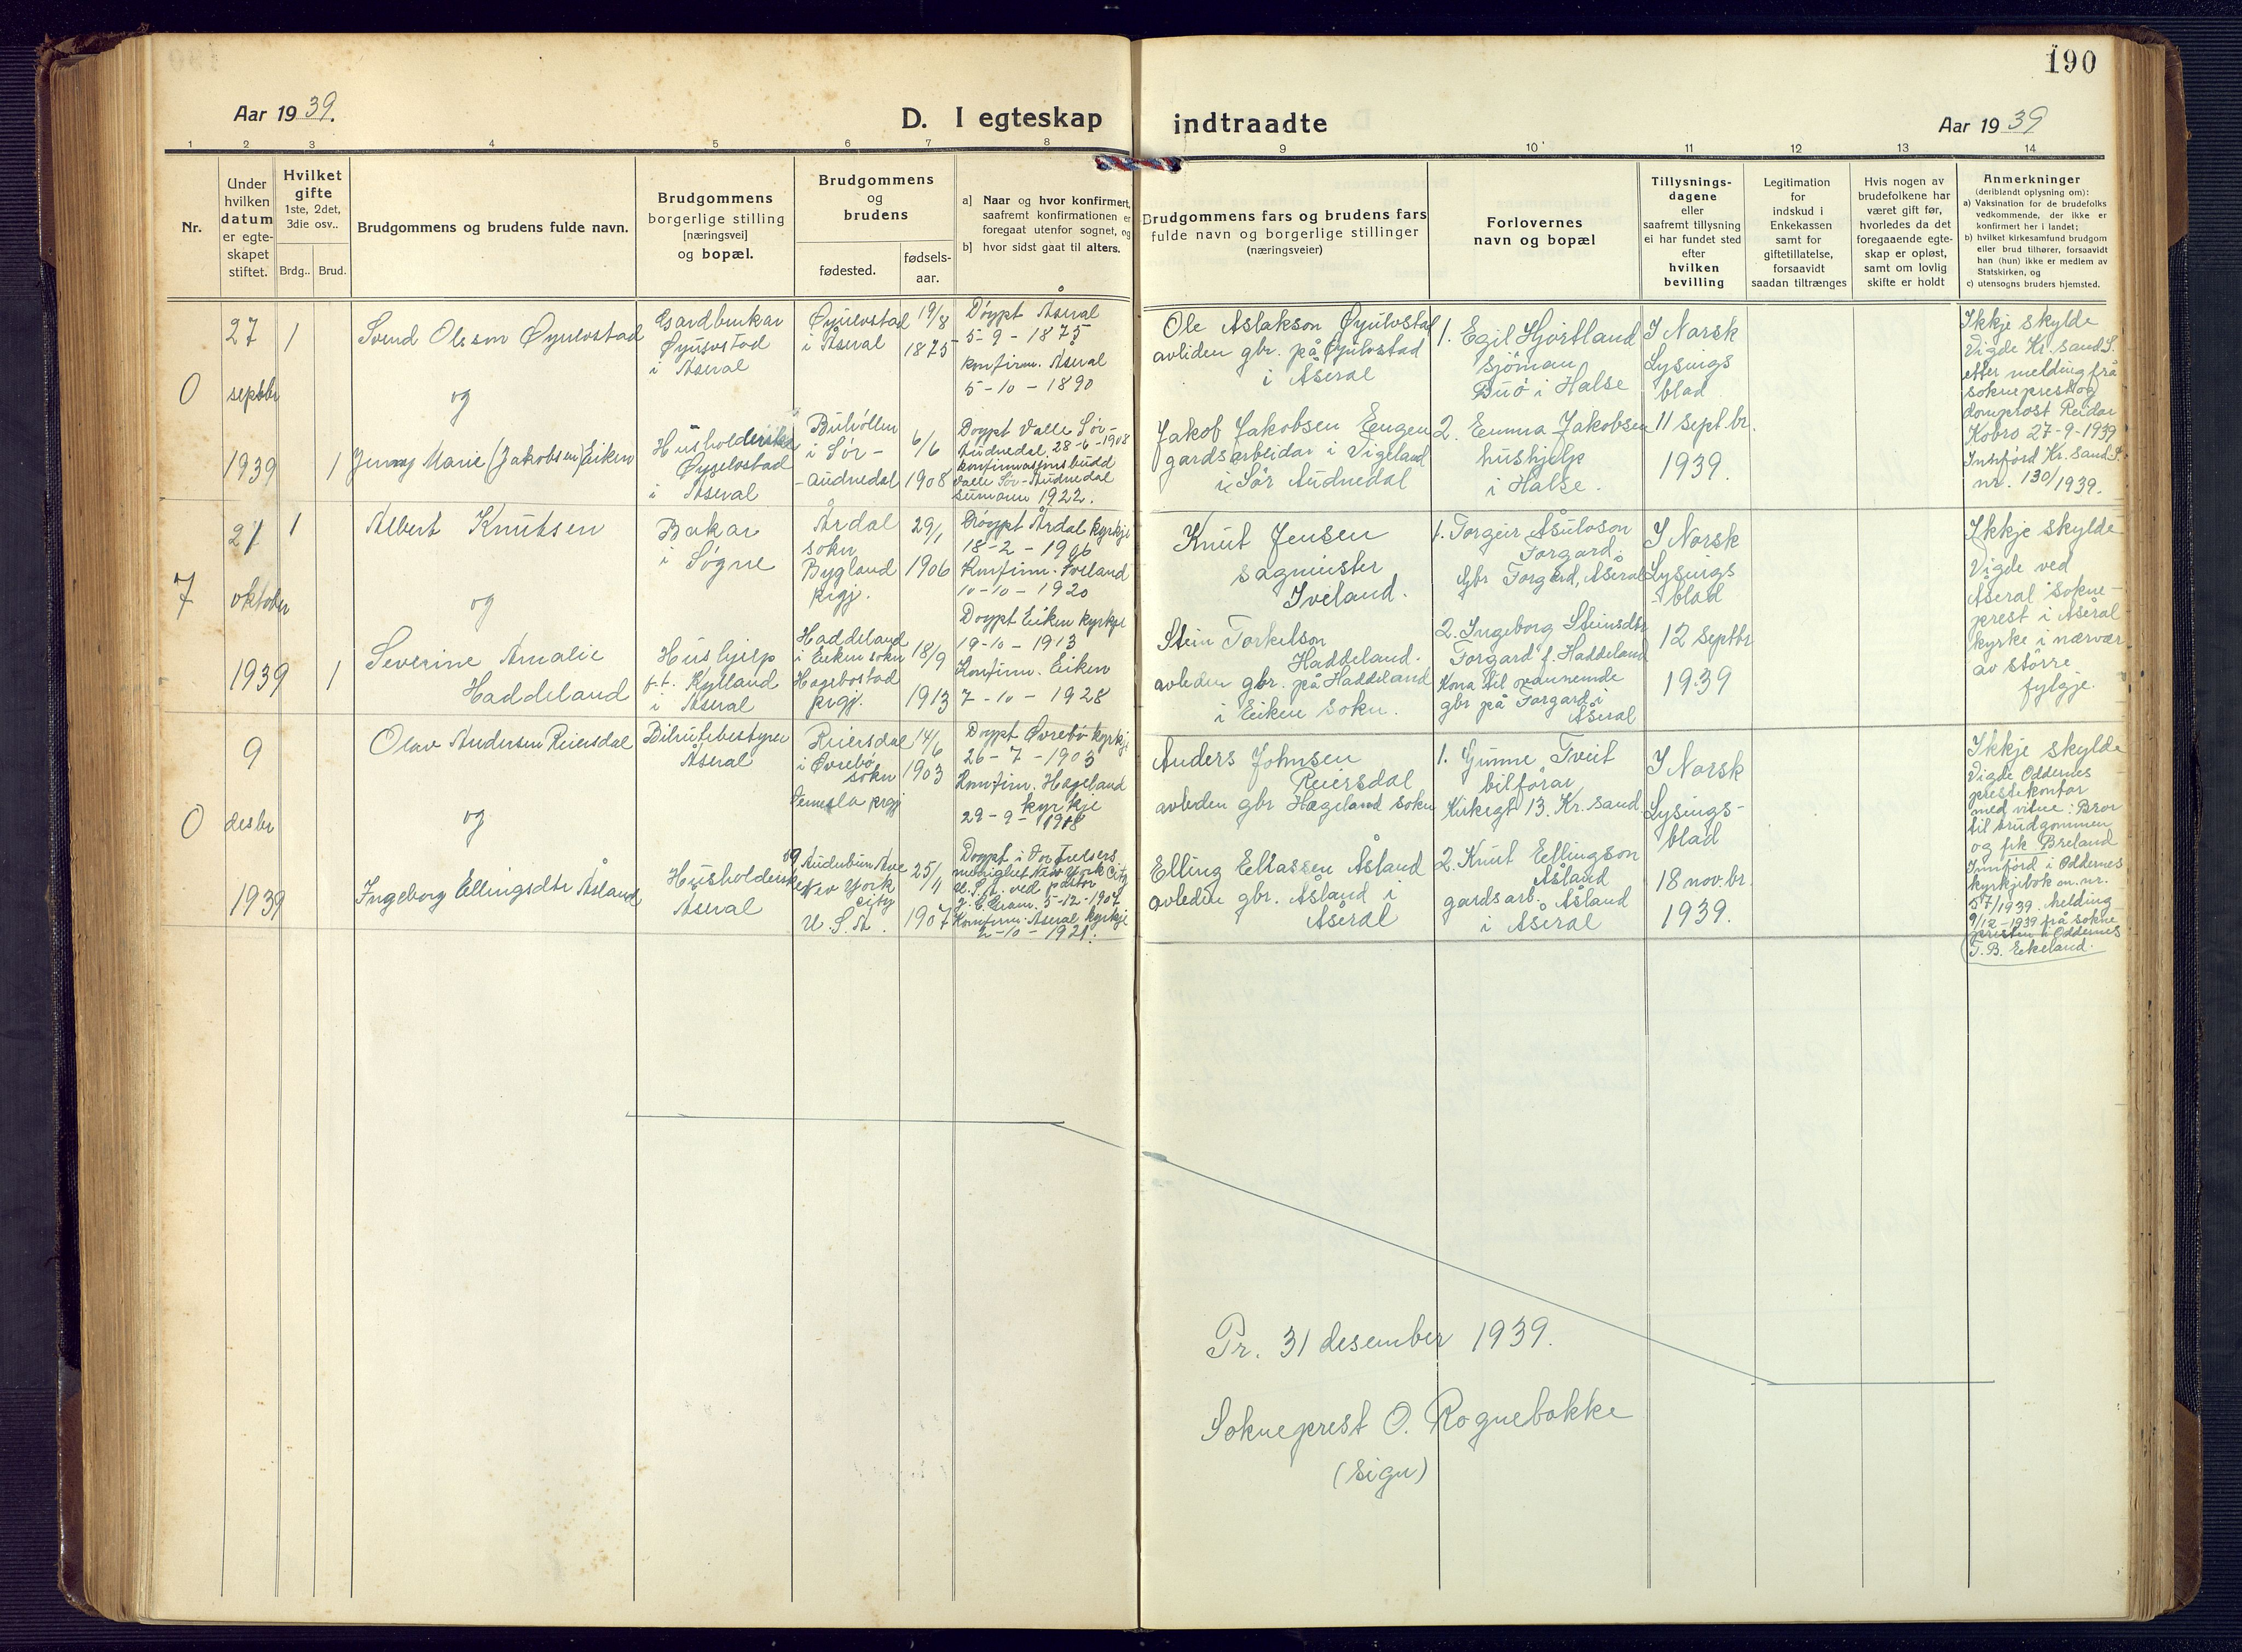 SAK, Åseral sokneprestkontor, F/Fb/L0004: Klokkerbok nr. B 4, 1920-1946, s. 190